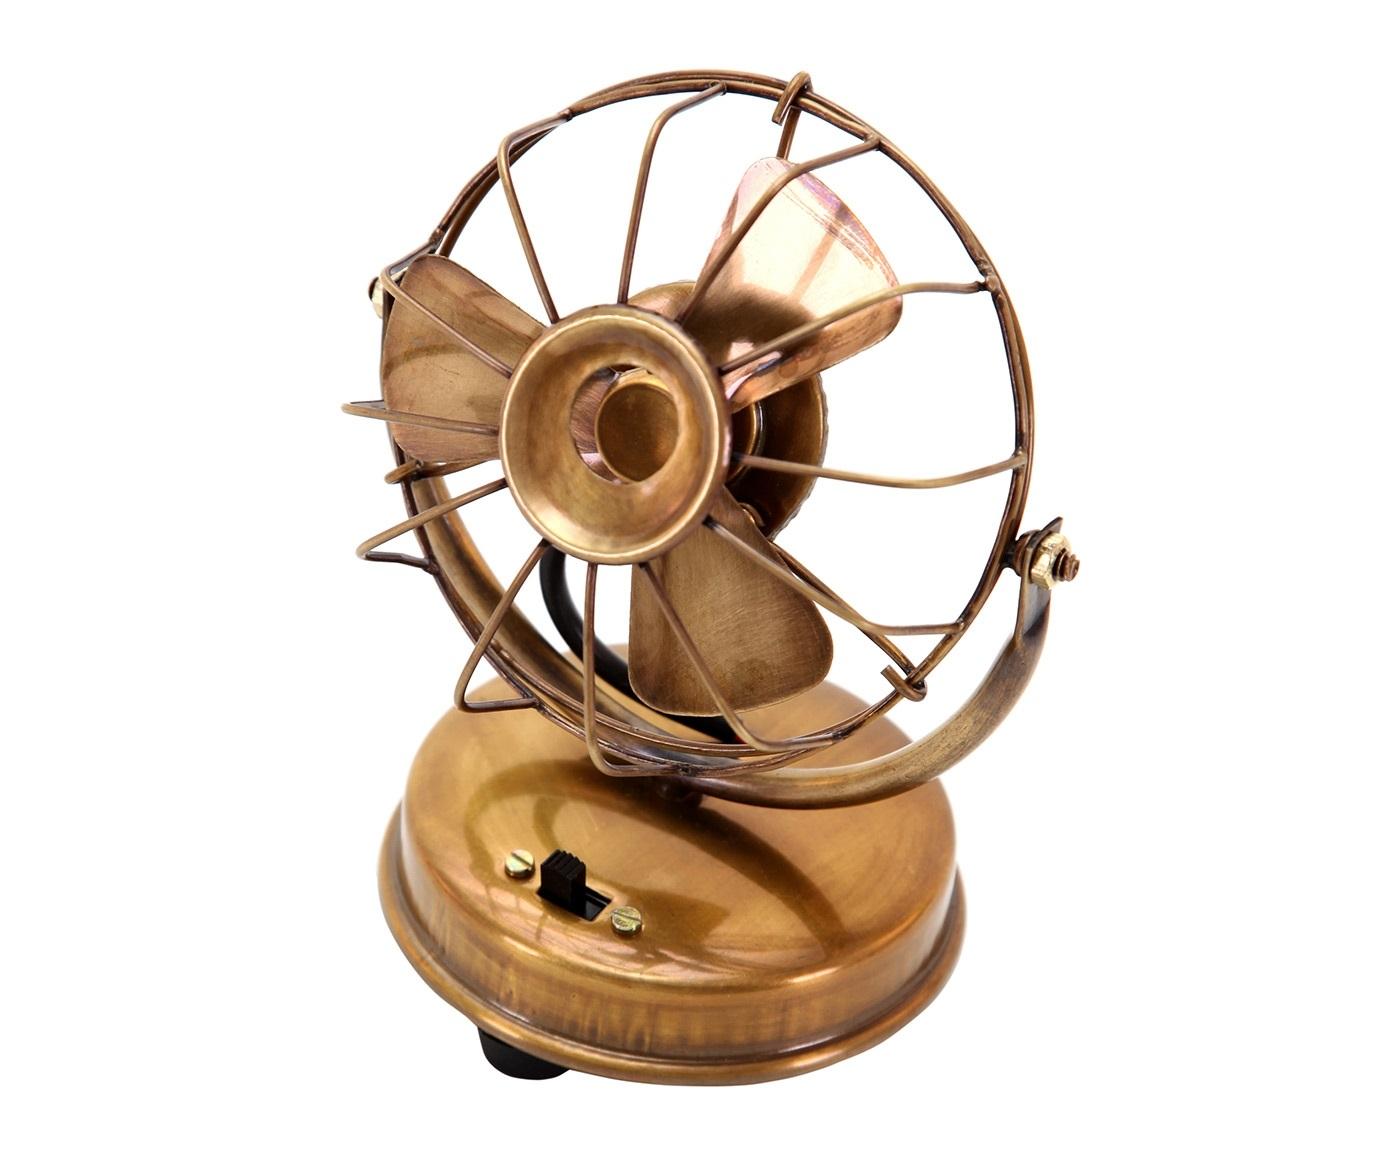 Мини вентилятор AnticДругое<br><br><br>Material: Латунь<br>Ширина см: 12<br>Высота см: 15<br>Глубина см: 9